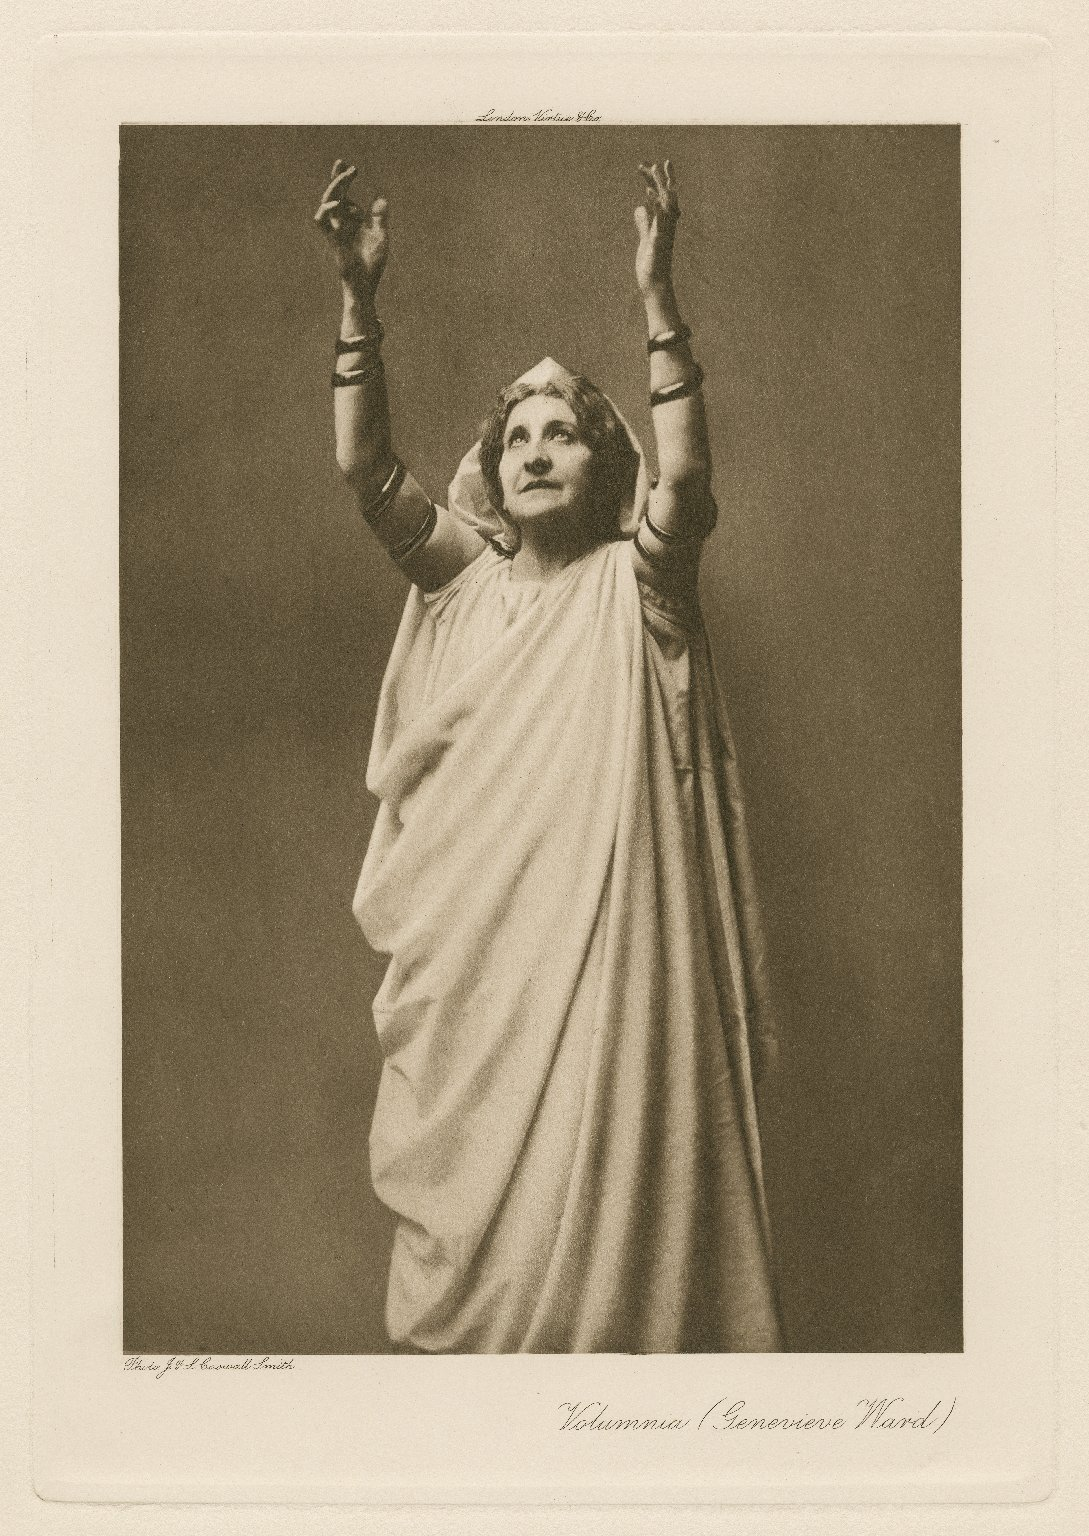 Volumnia (Genevieve Ward) [in Shakespeare's Coriolanus] [graphic] / photo, J. & L. Caswall Smith.